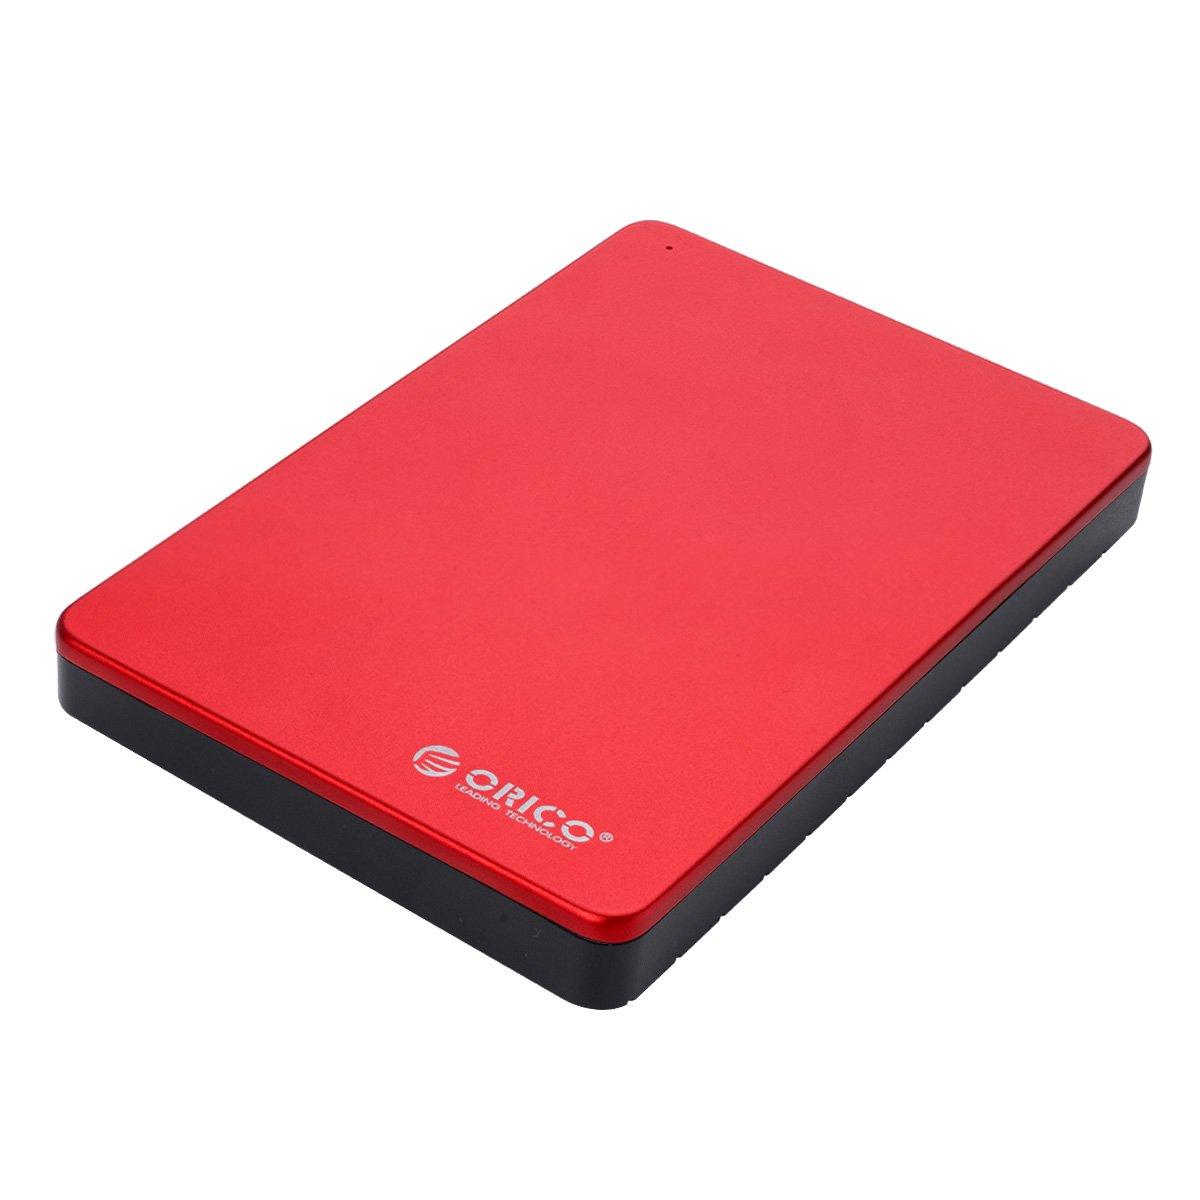 ORICO Ultra Compact 2.5 inch Hard Drive Enclosure, Aluminum USB3.0 HDD Enclosure for SATA HDD/SSD - Tool Free